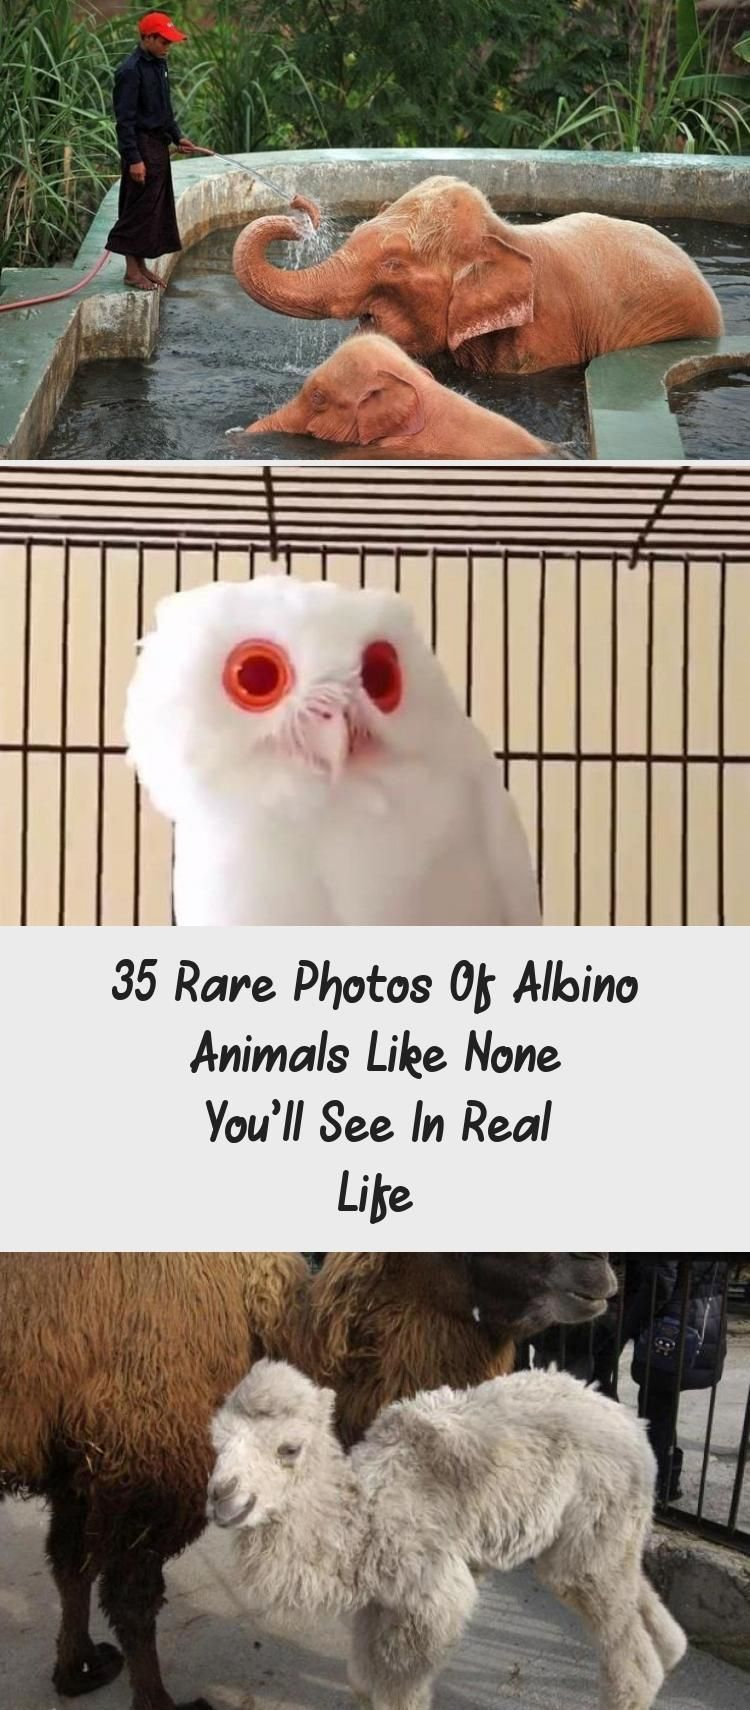 35 Rare Photos Of Albino Animals Like None You'll See In Real Life #albinoanimals 35 Rare Photos Of Albino Animals Like None You'll See In Real Life #OceanAnimals #FarmAnimals #SeaAnimals #AnimalsRaros #AnimalsRare #albinoanimals